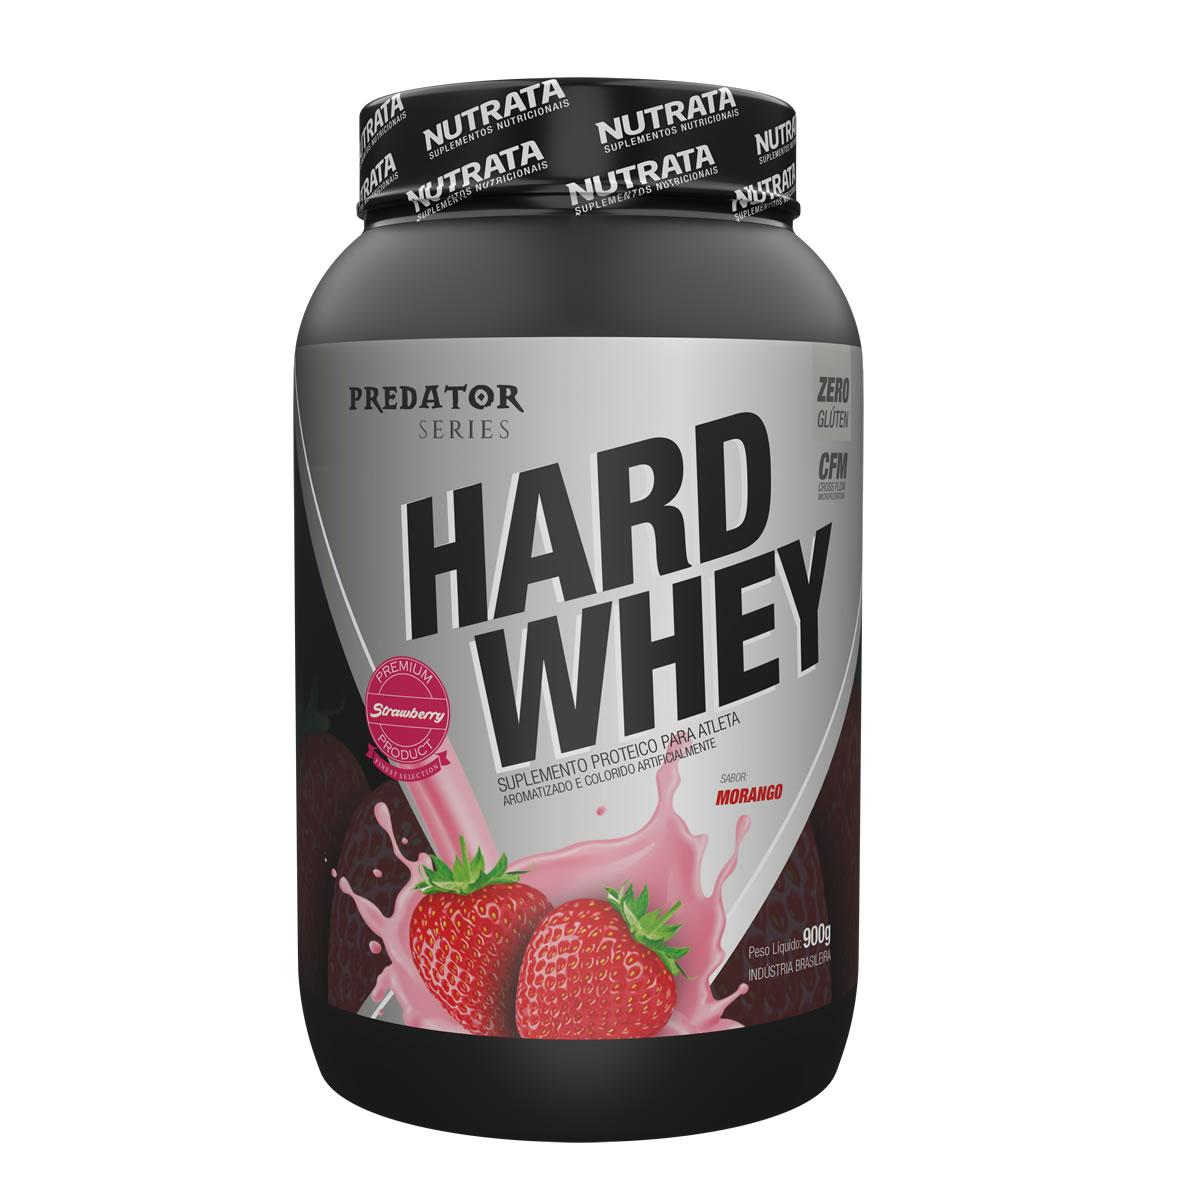 Hard Whey Predator sabor Morango 900g - Nutrata